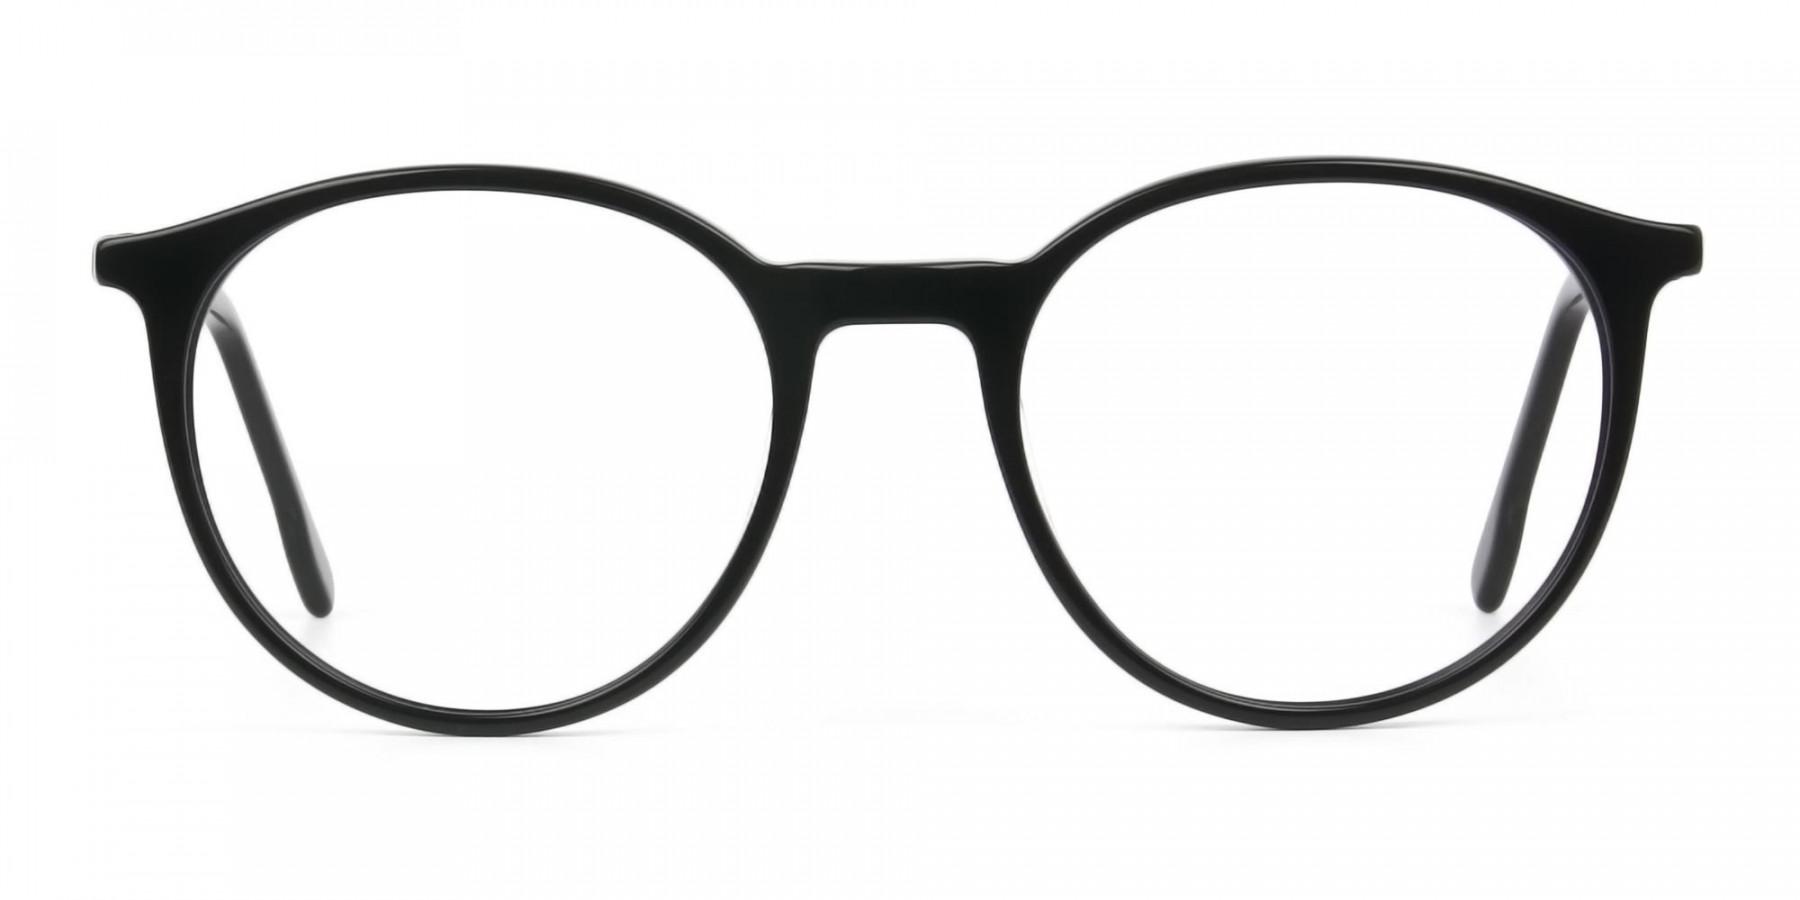 Designer Black Acetate Eyeglasses in Round Men Women - 1